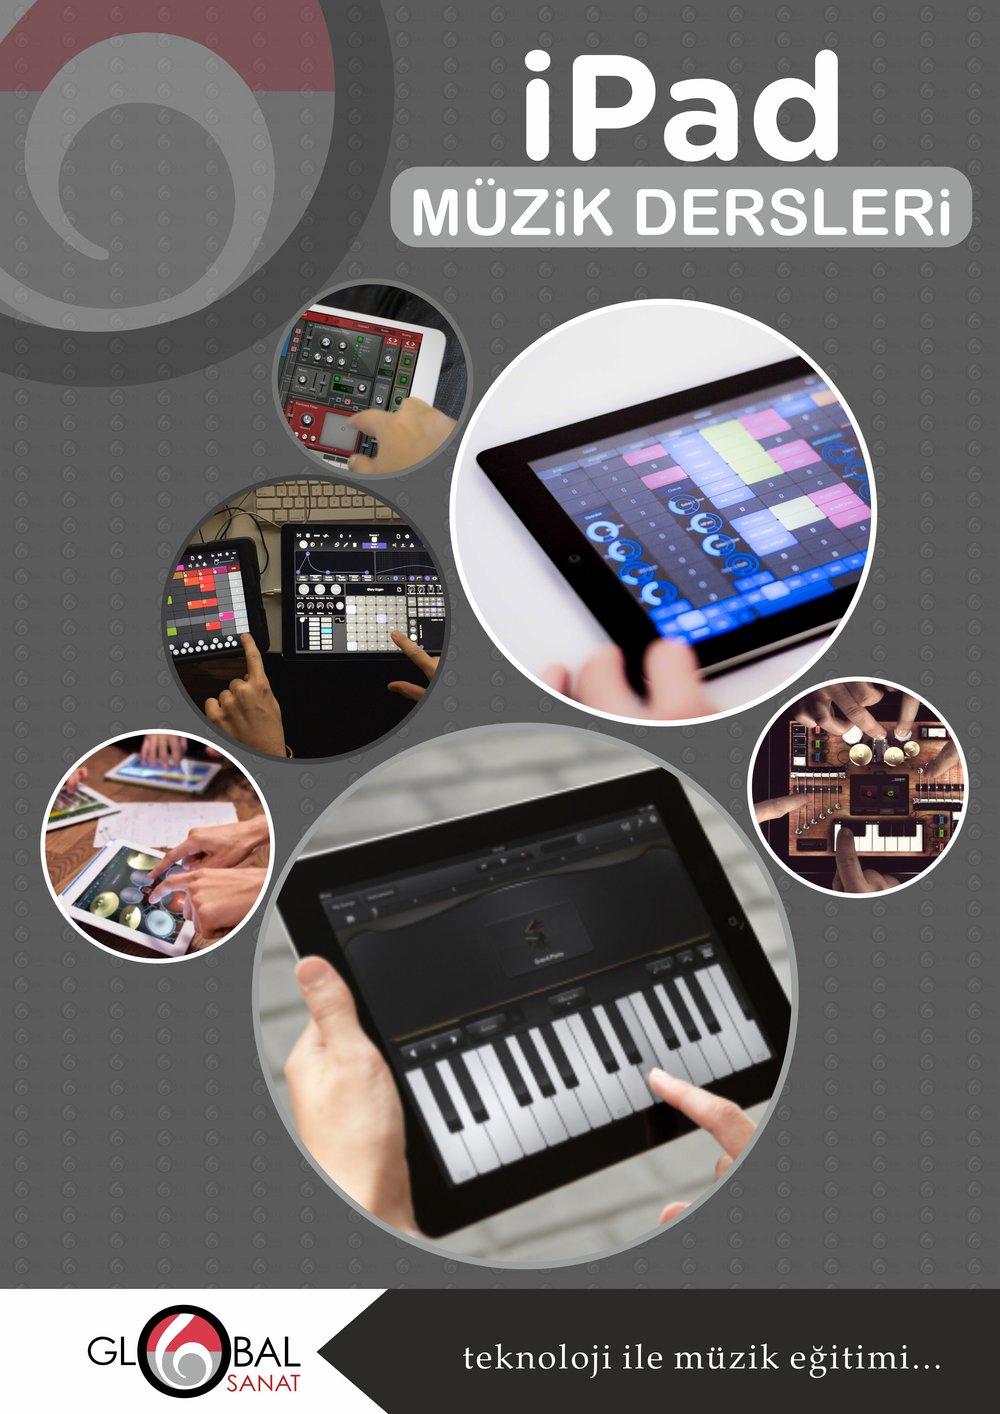 Global Sanat İpad Müzik Dersleri.jpeg